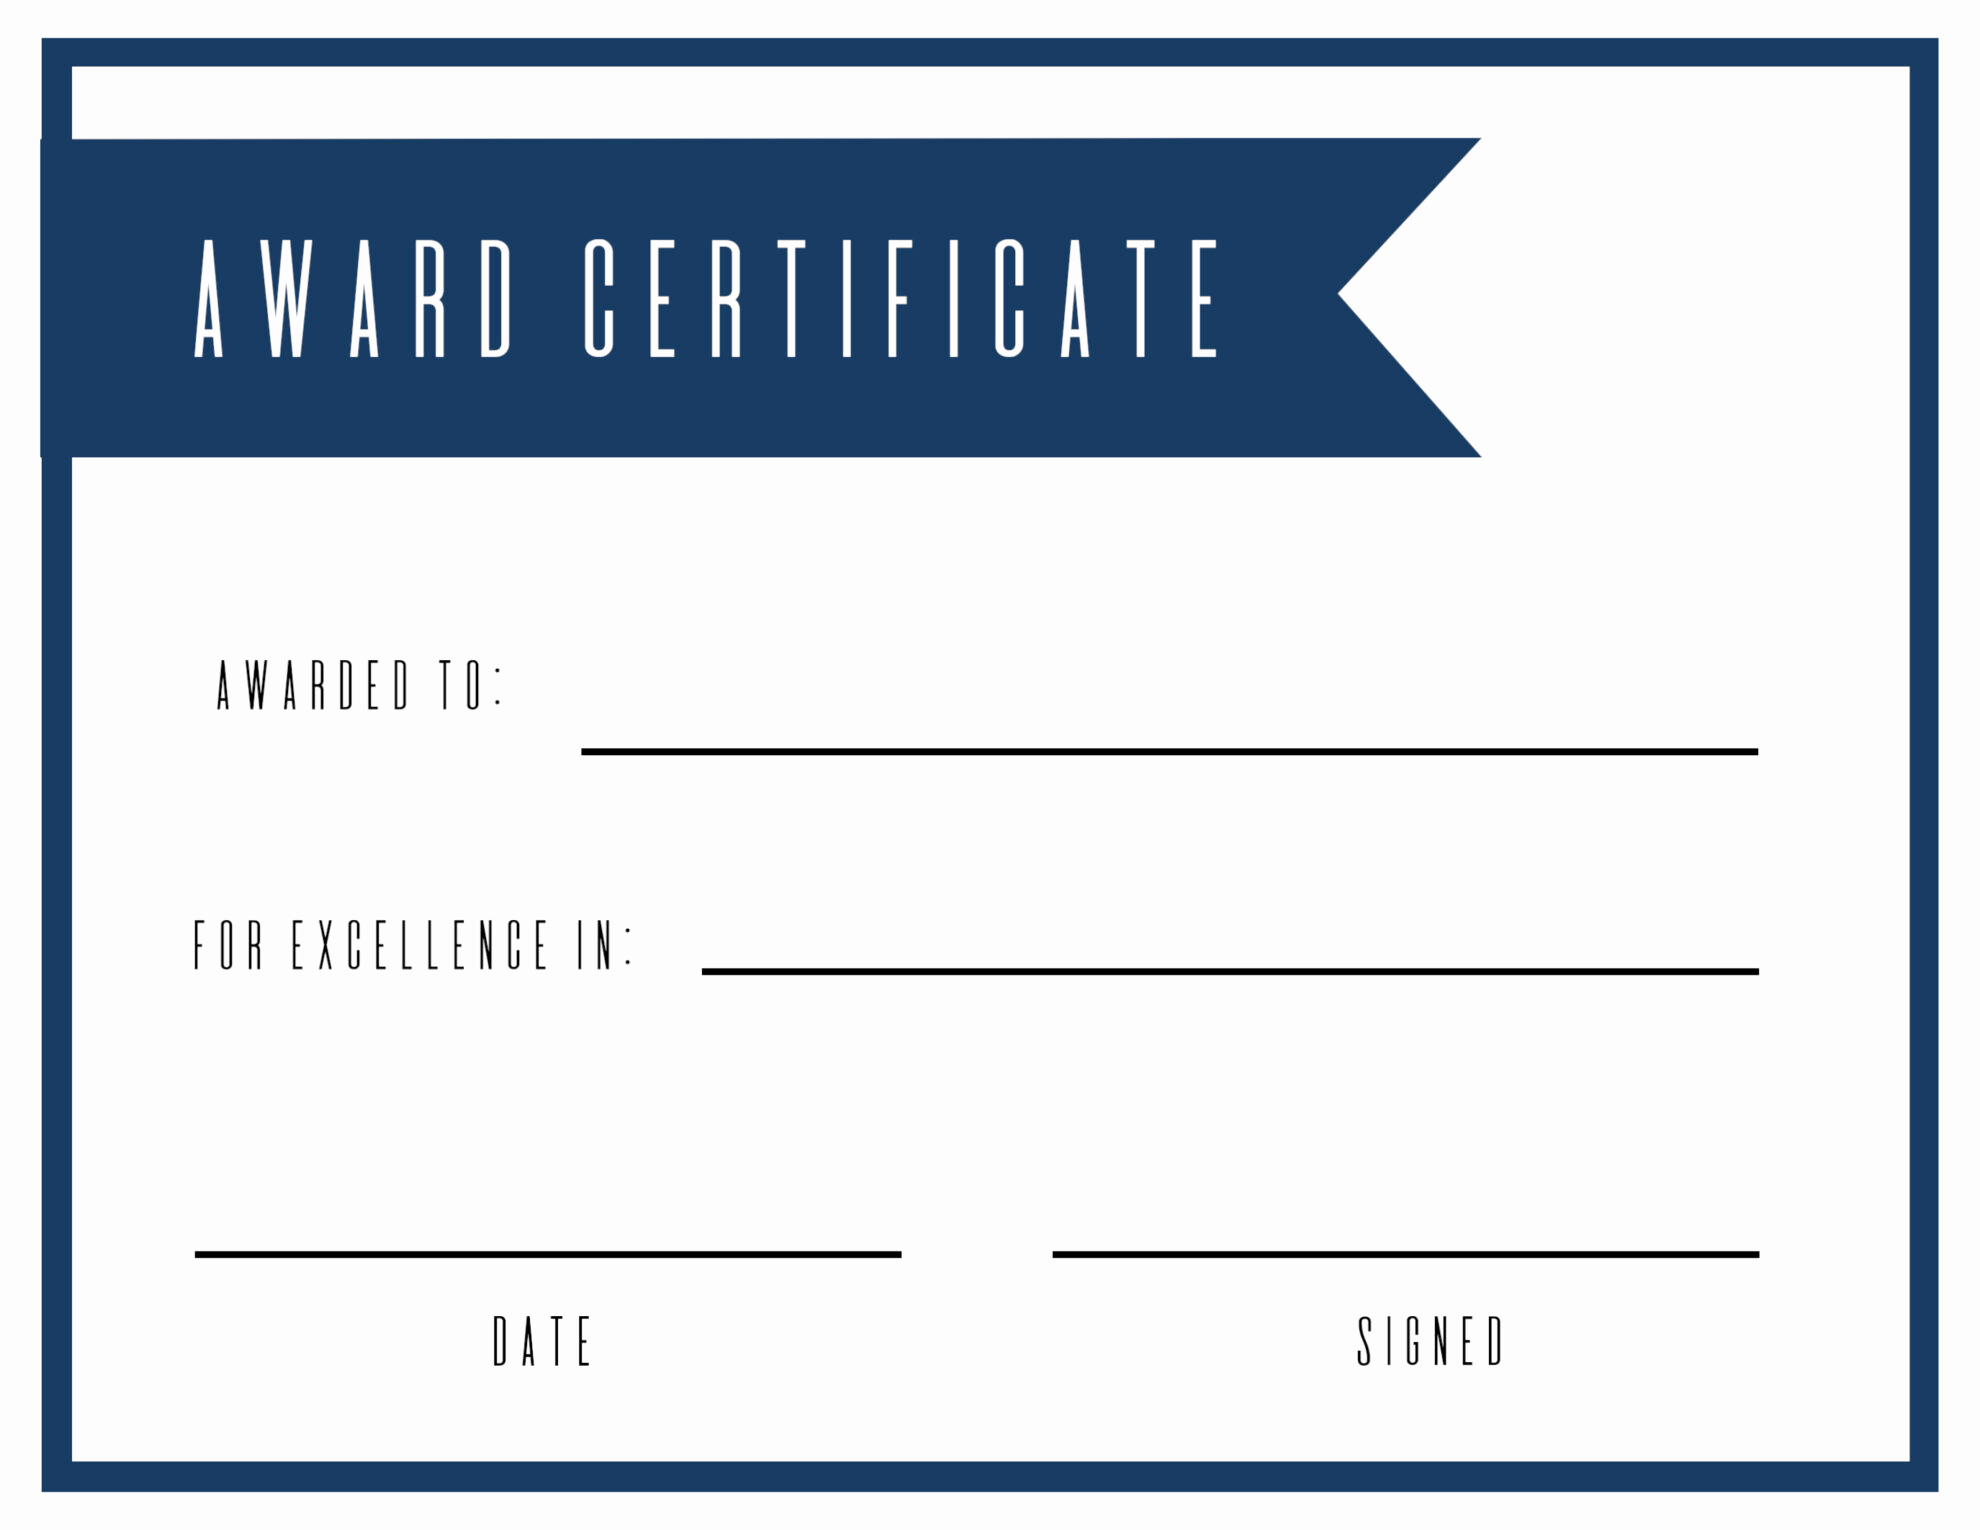 Free Printable Award Certificates New Free Printable Award Certificate Template Paper Trail Design